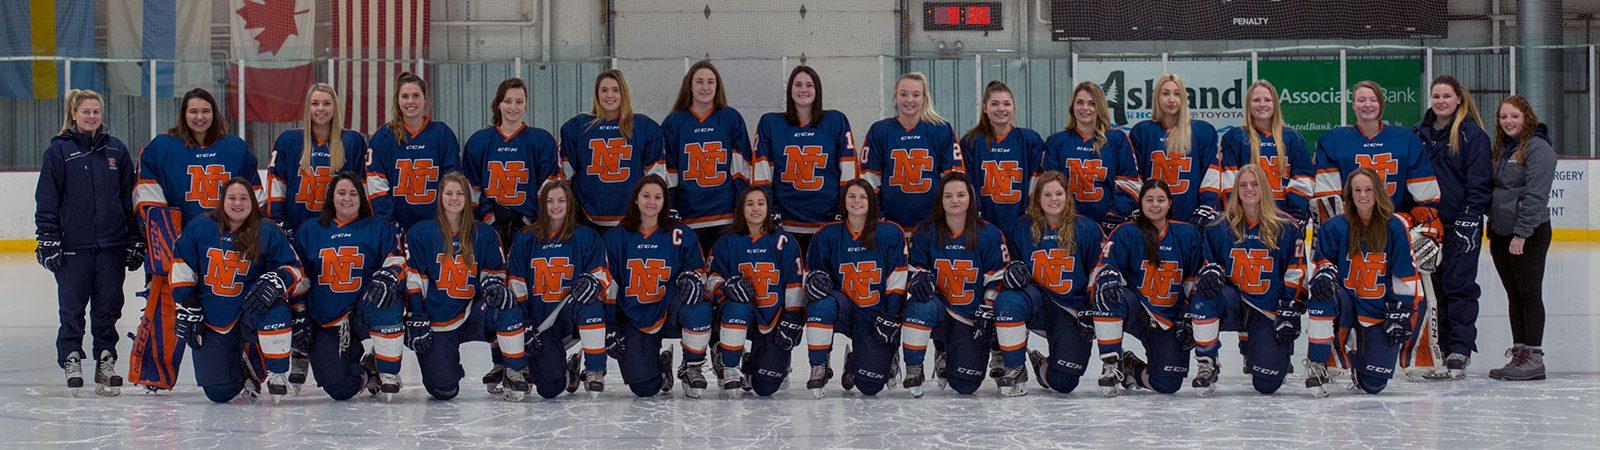 Womens Hockey 2018-19 Team